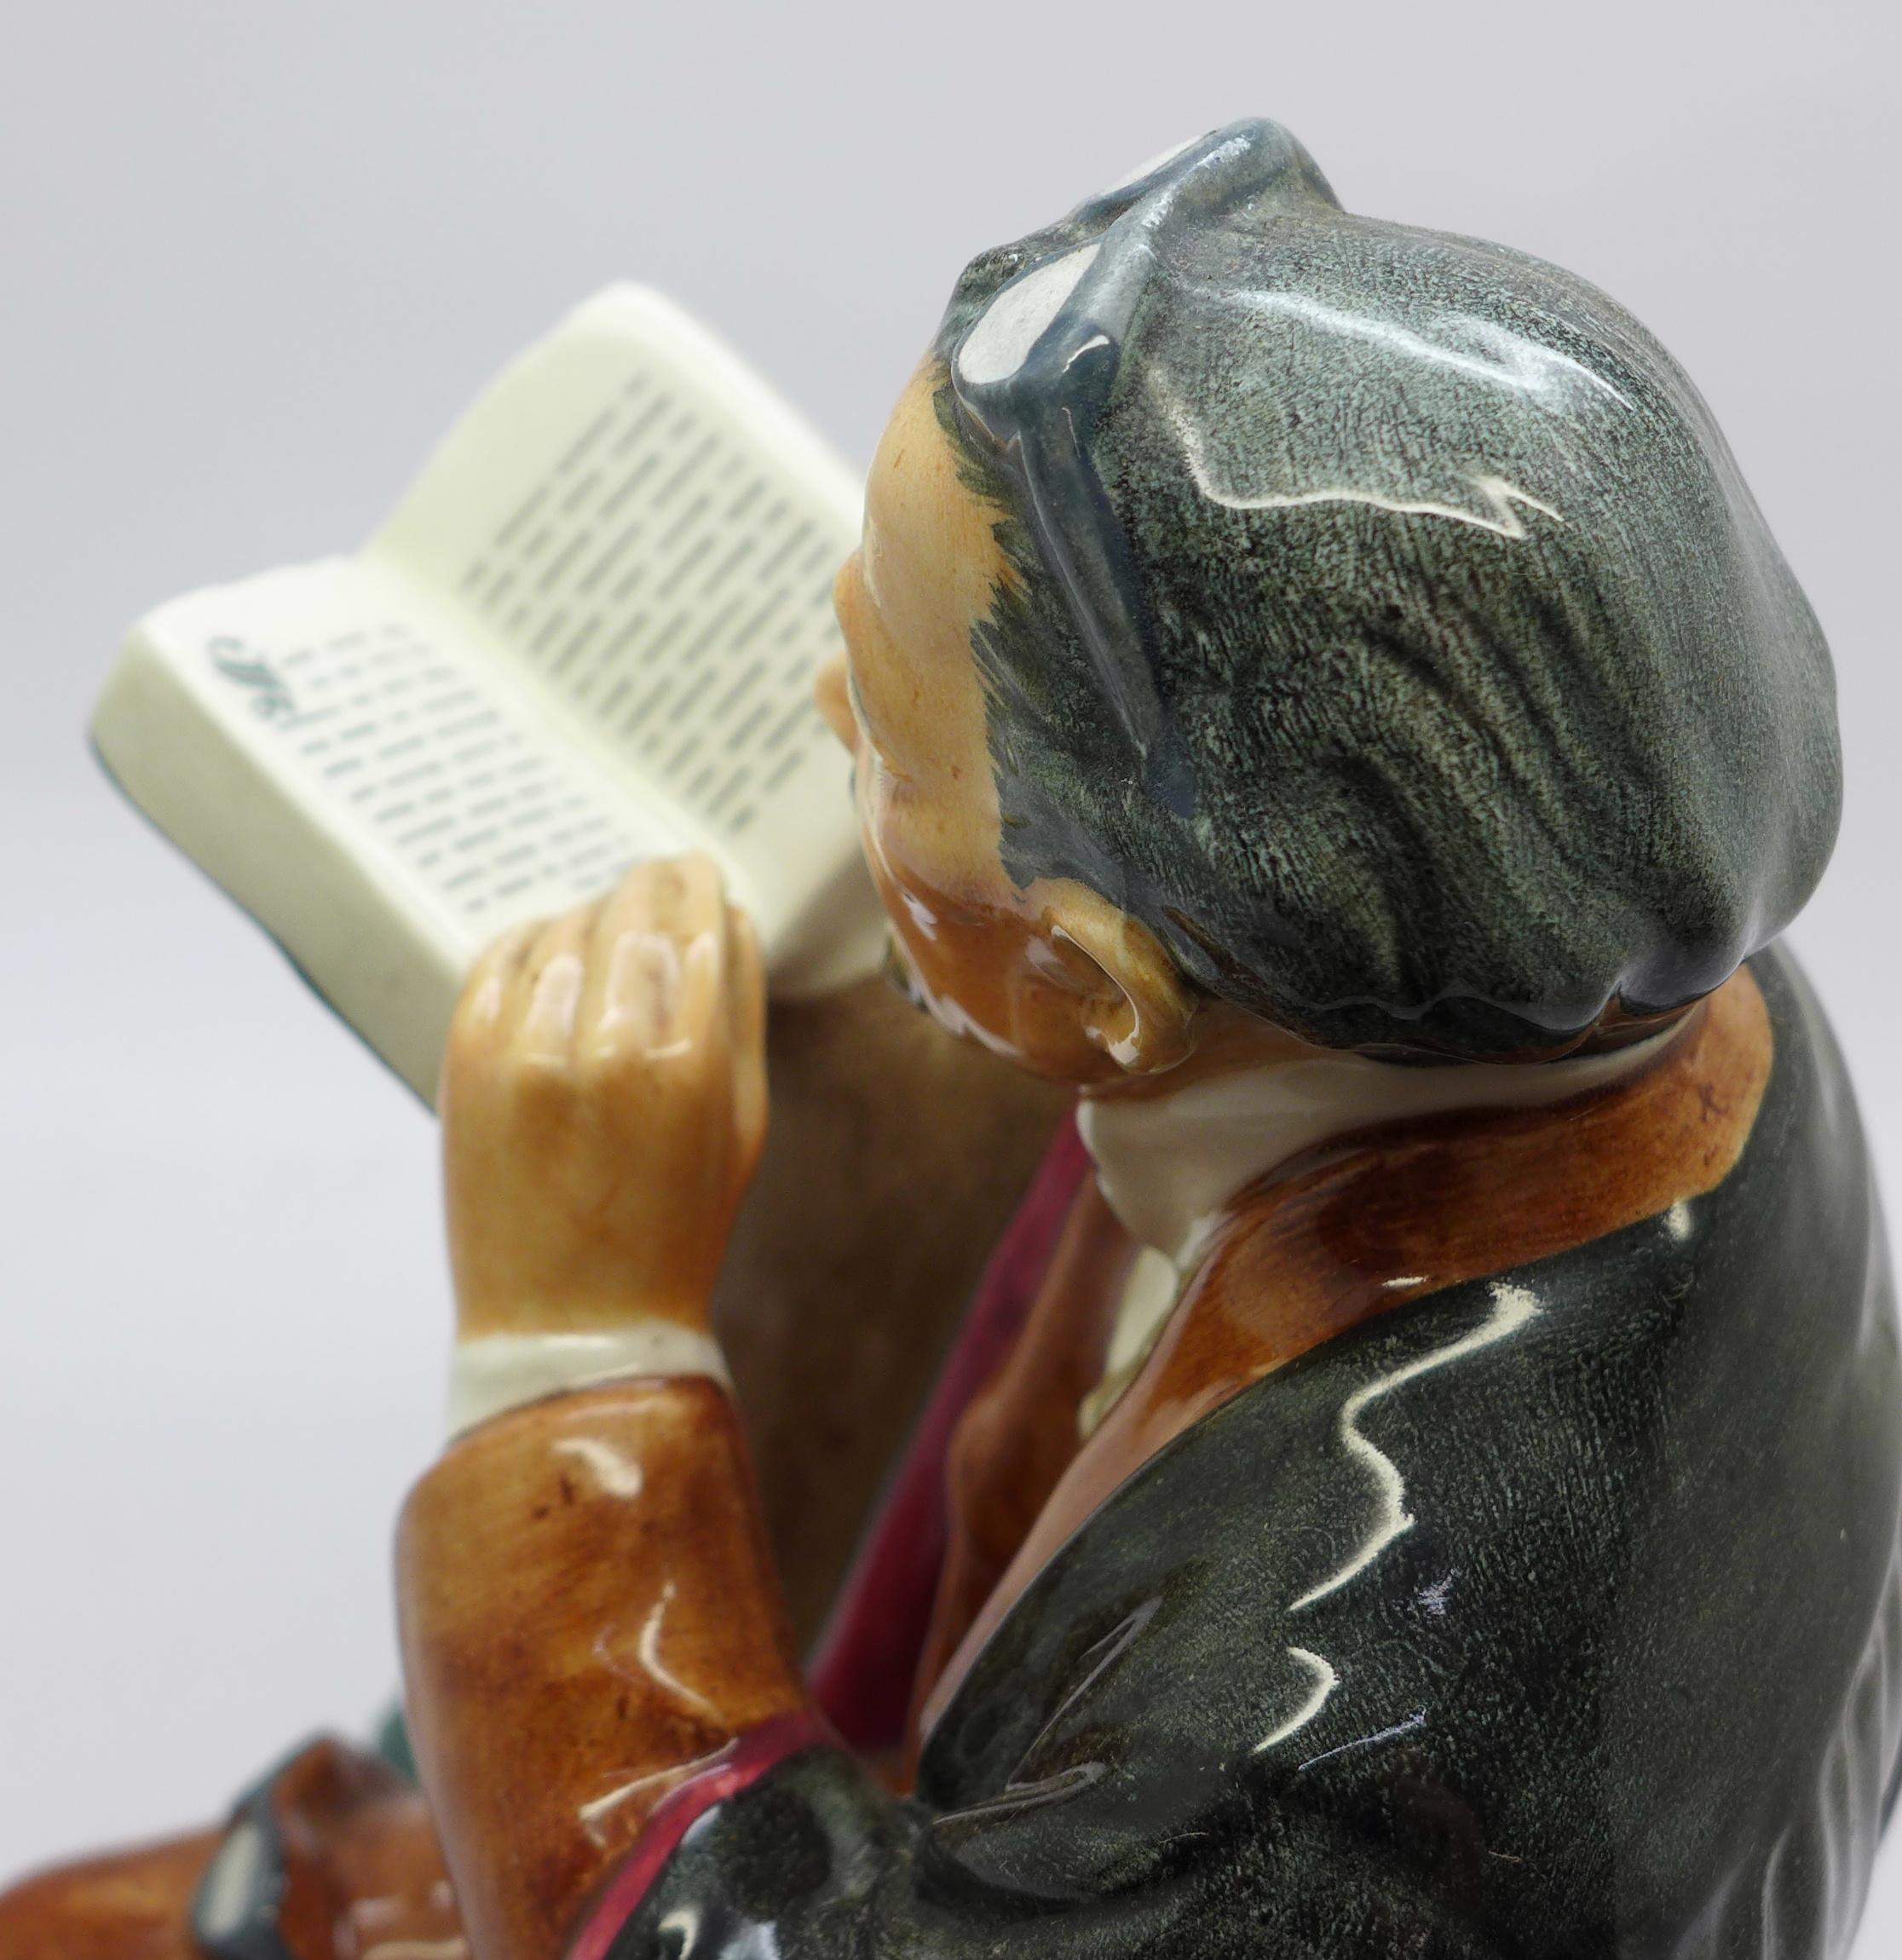 Lot 618 - A Royal Doulton figure, The Professor,